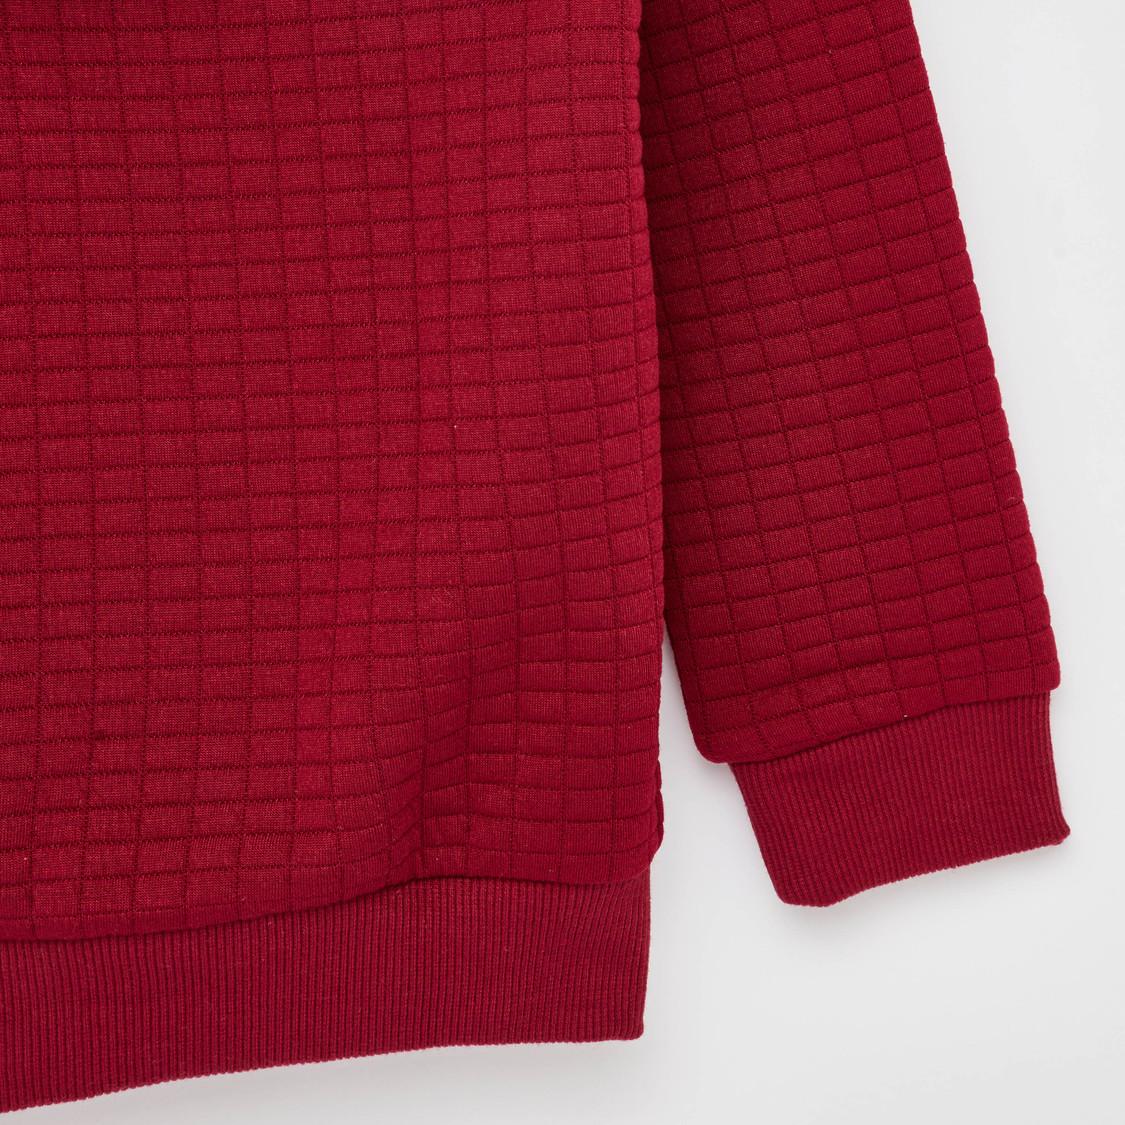 Textured Hoodie with Long Sleeves and Kangaroo Pocket